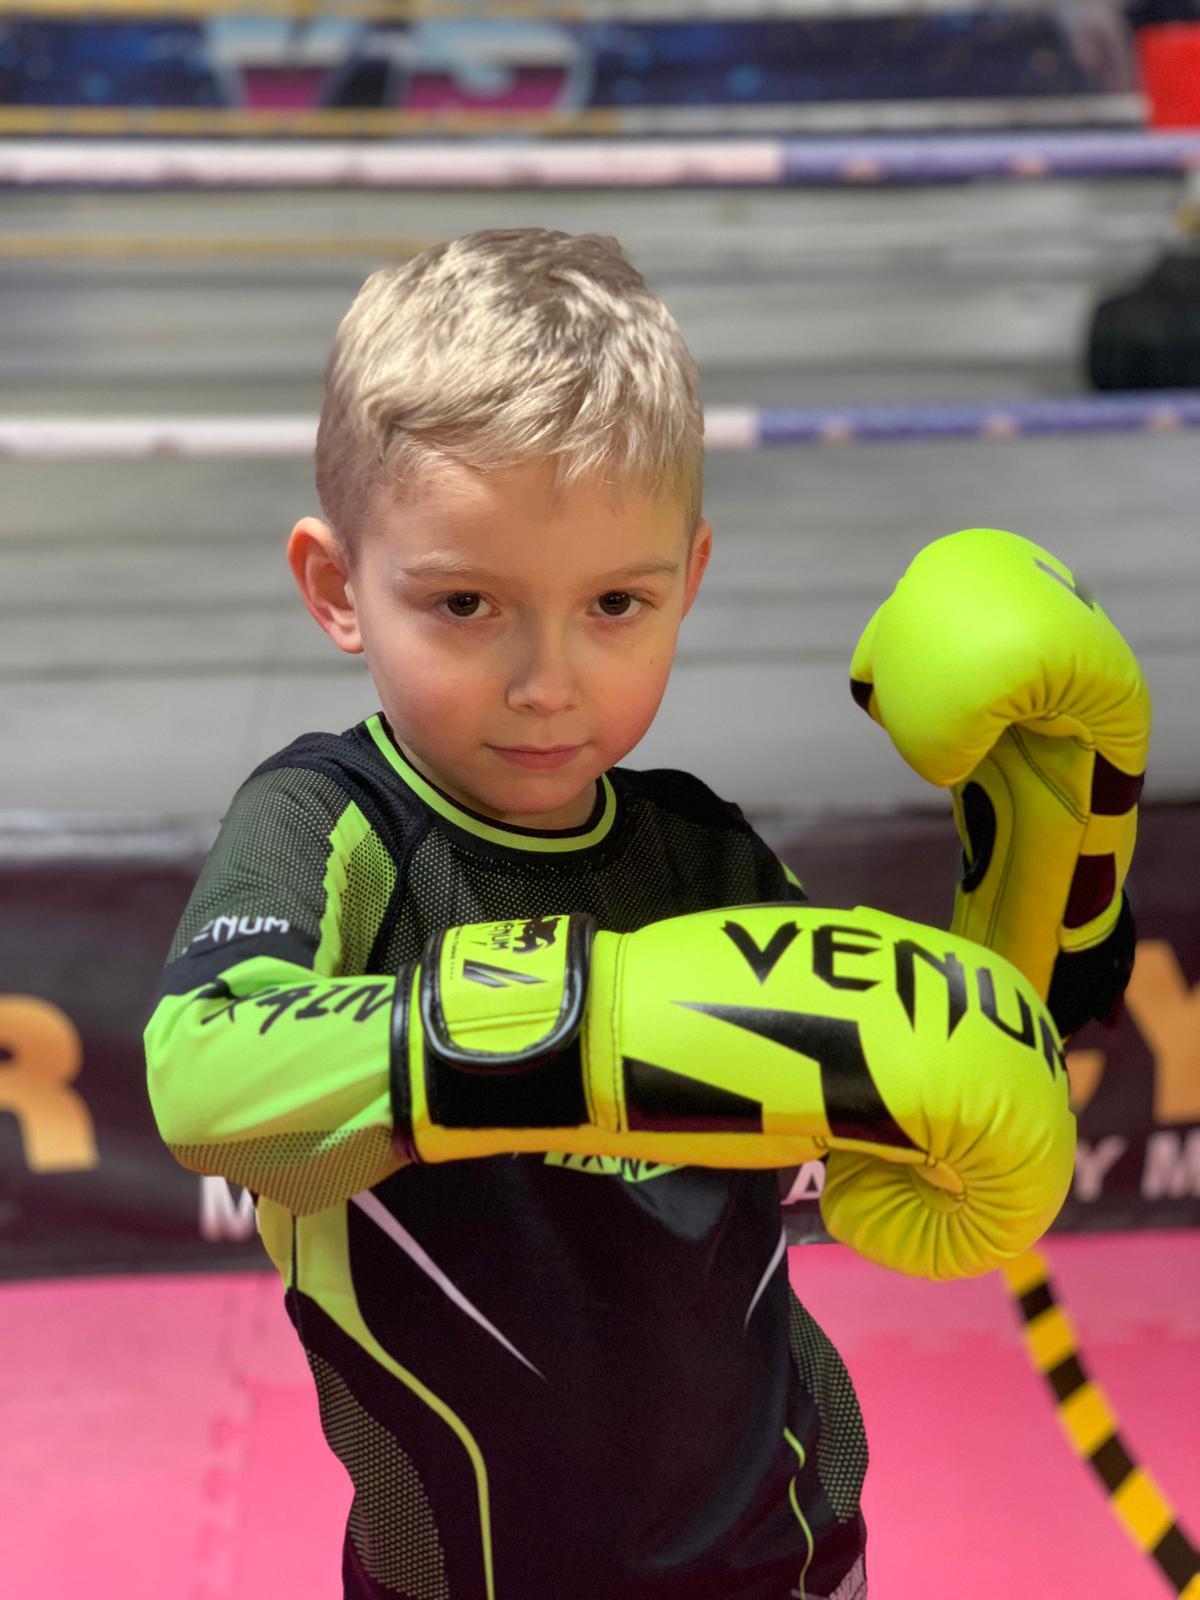 Venum Training Wear